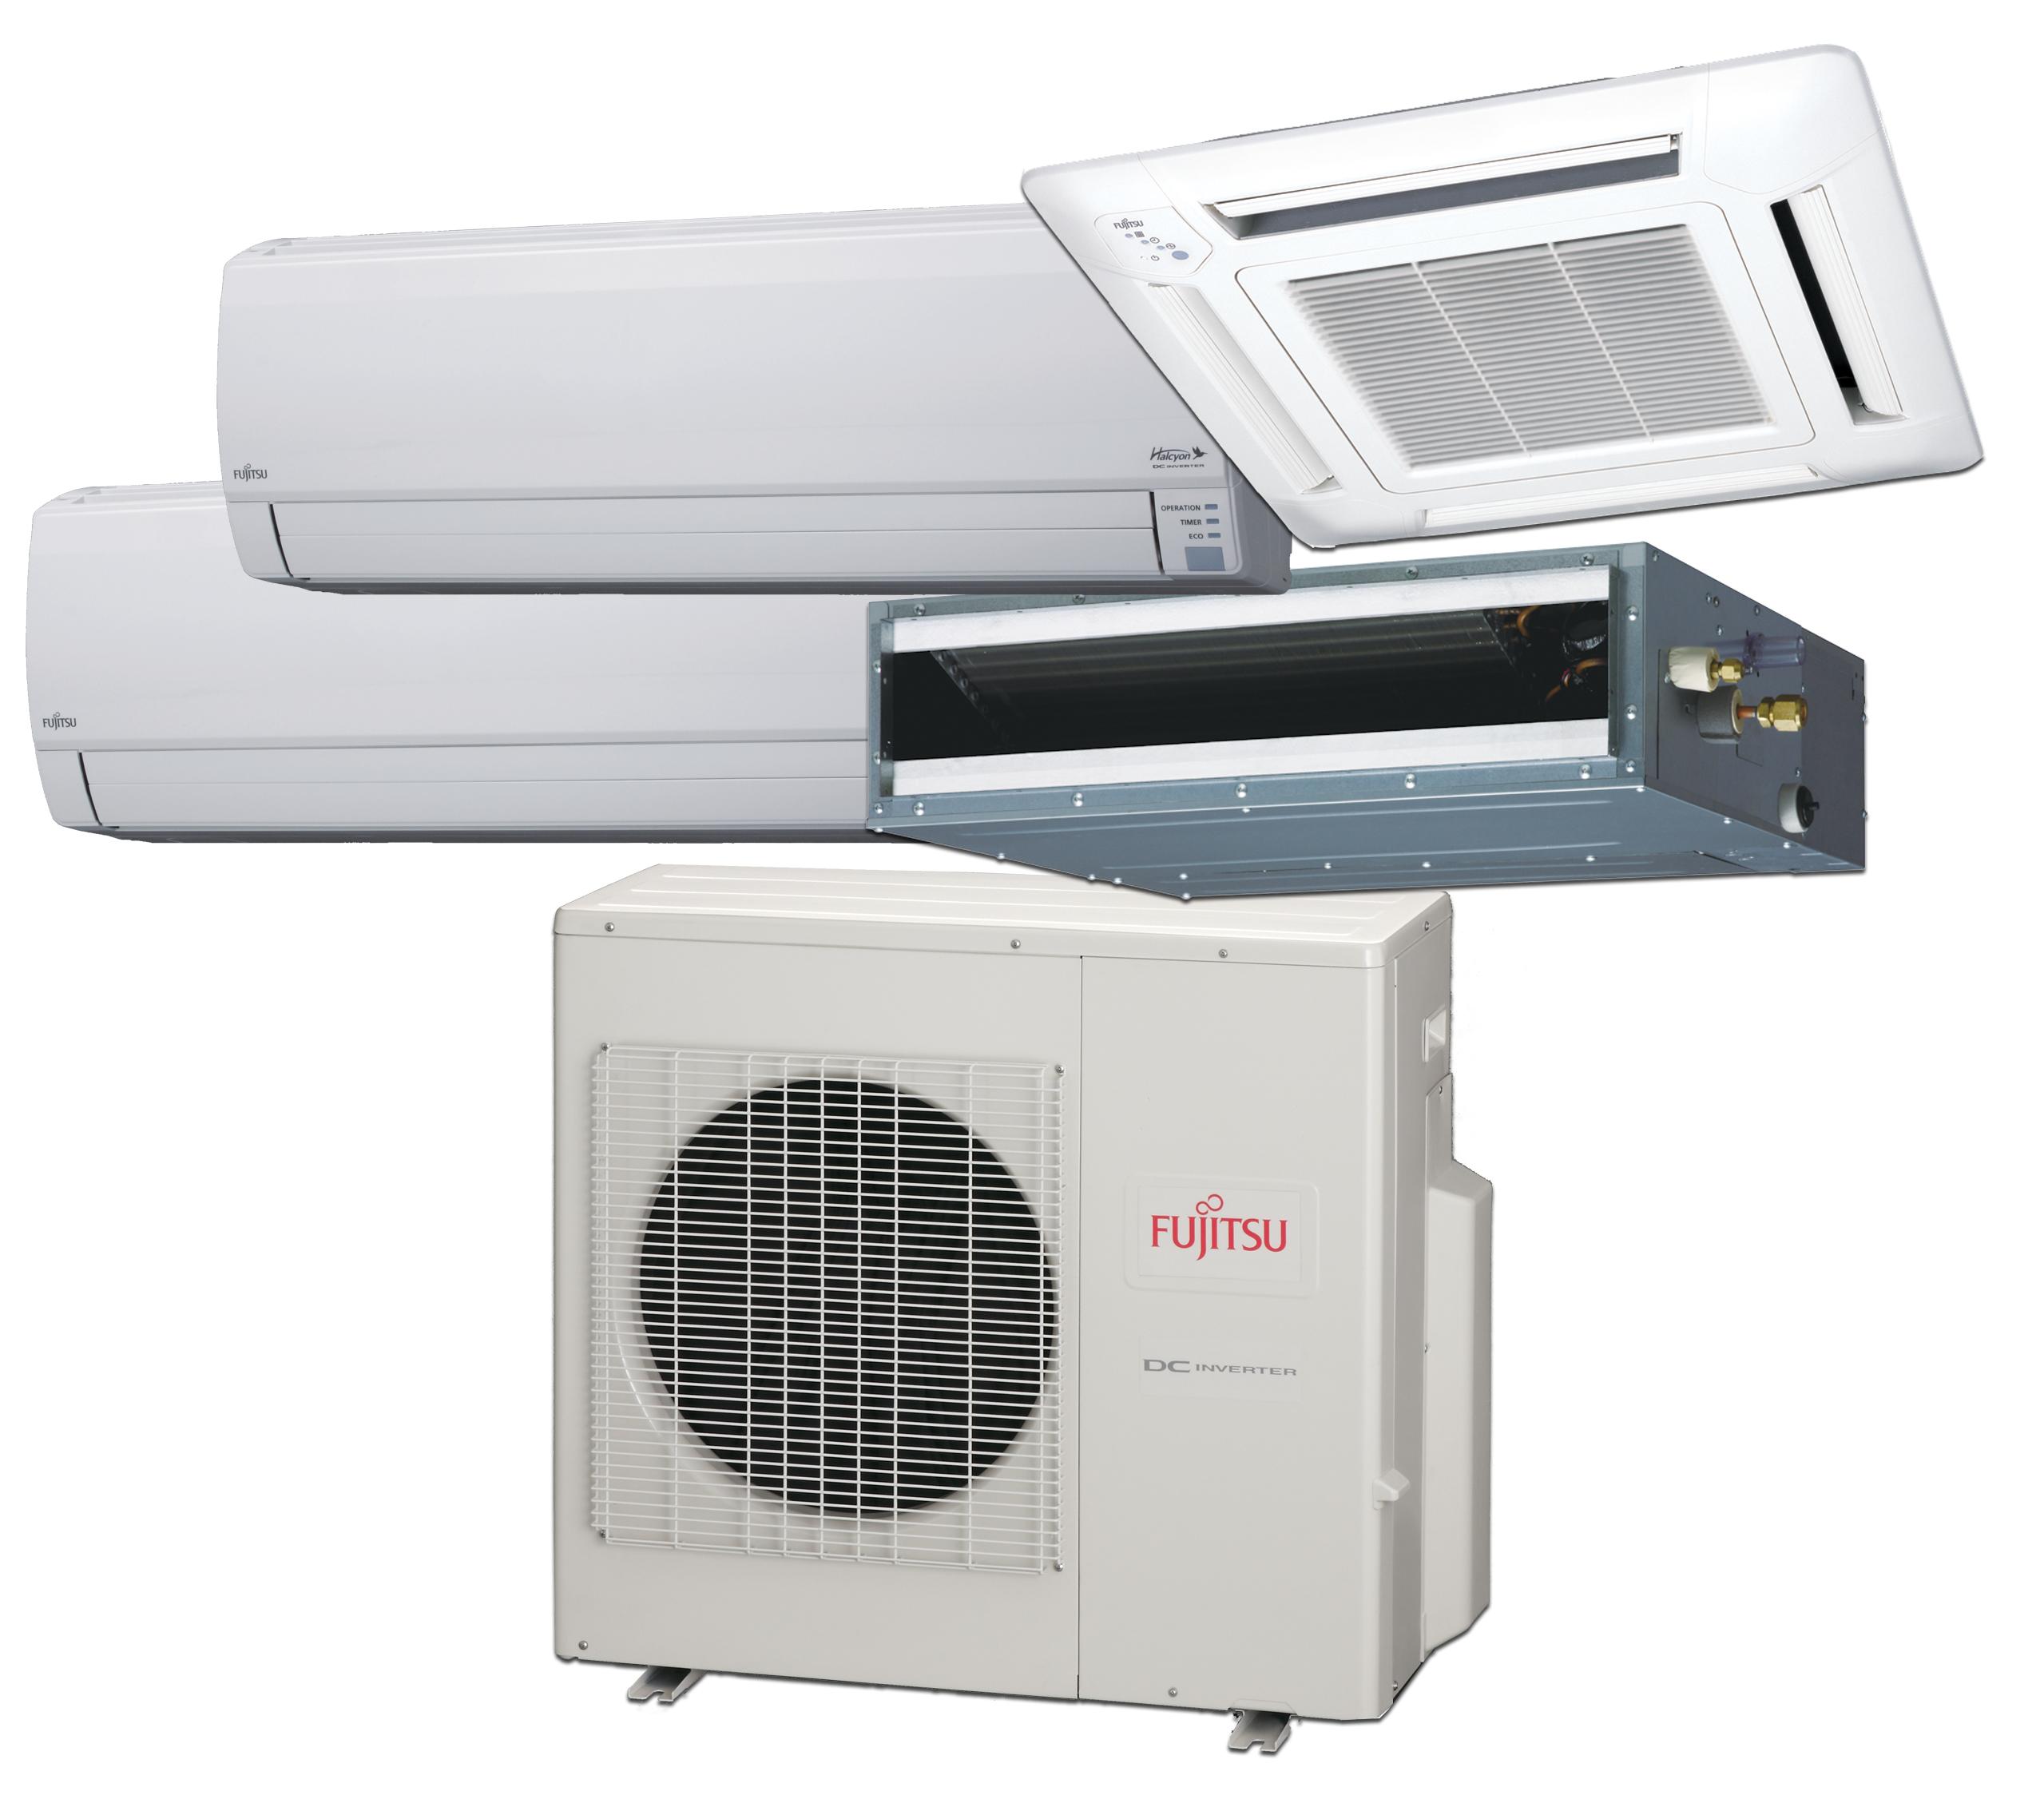 Fujitsu – Thermopompe Système Multizone – jusqu'à 3 zones (Série RLXFZ)